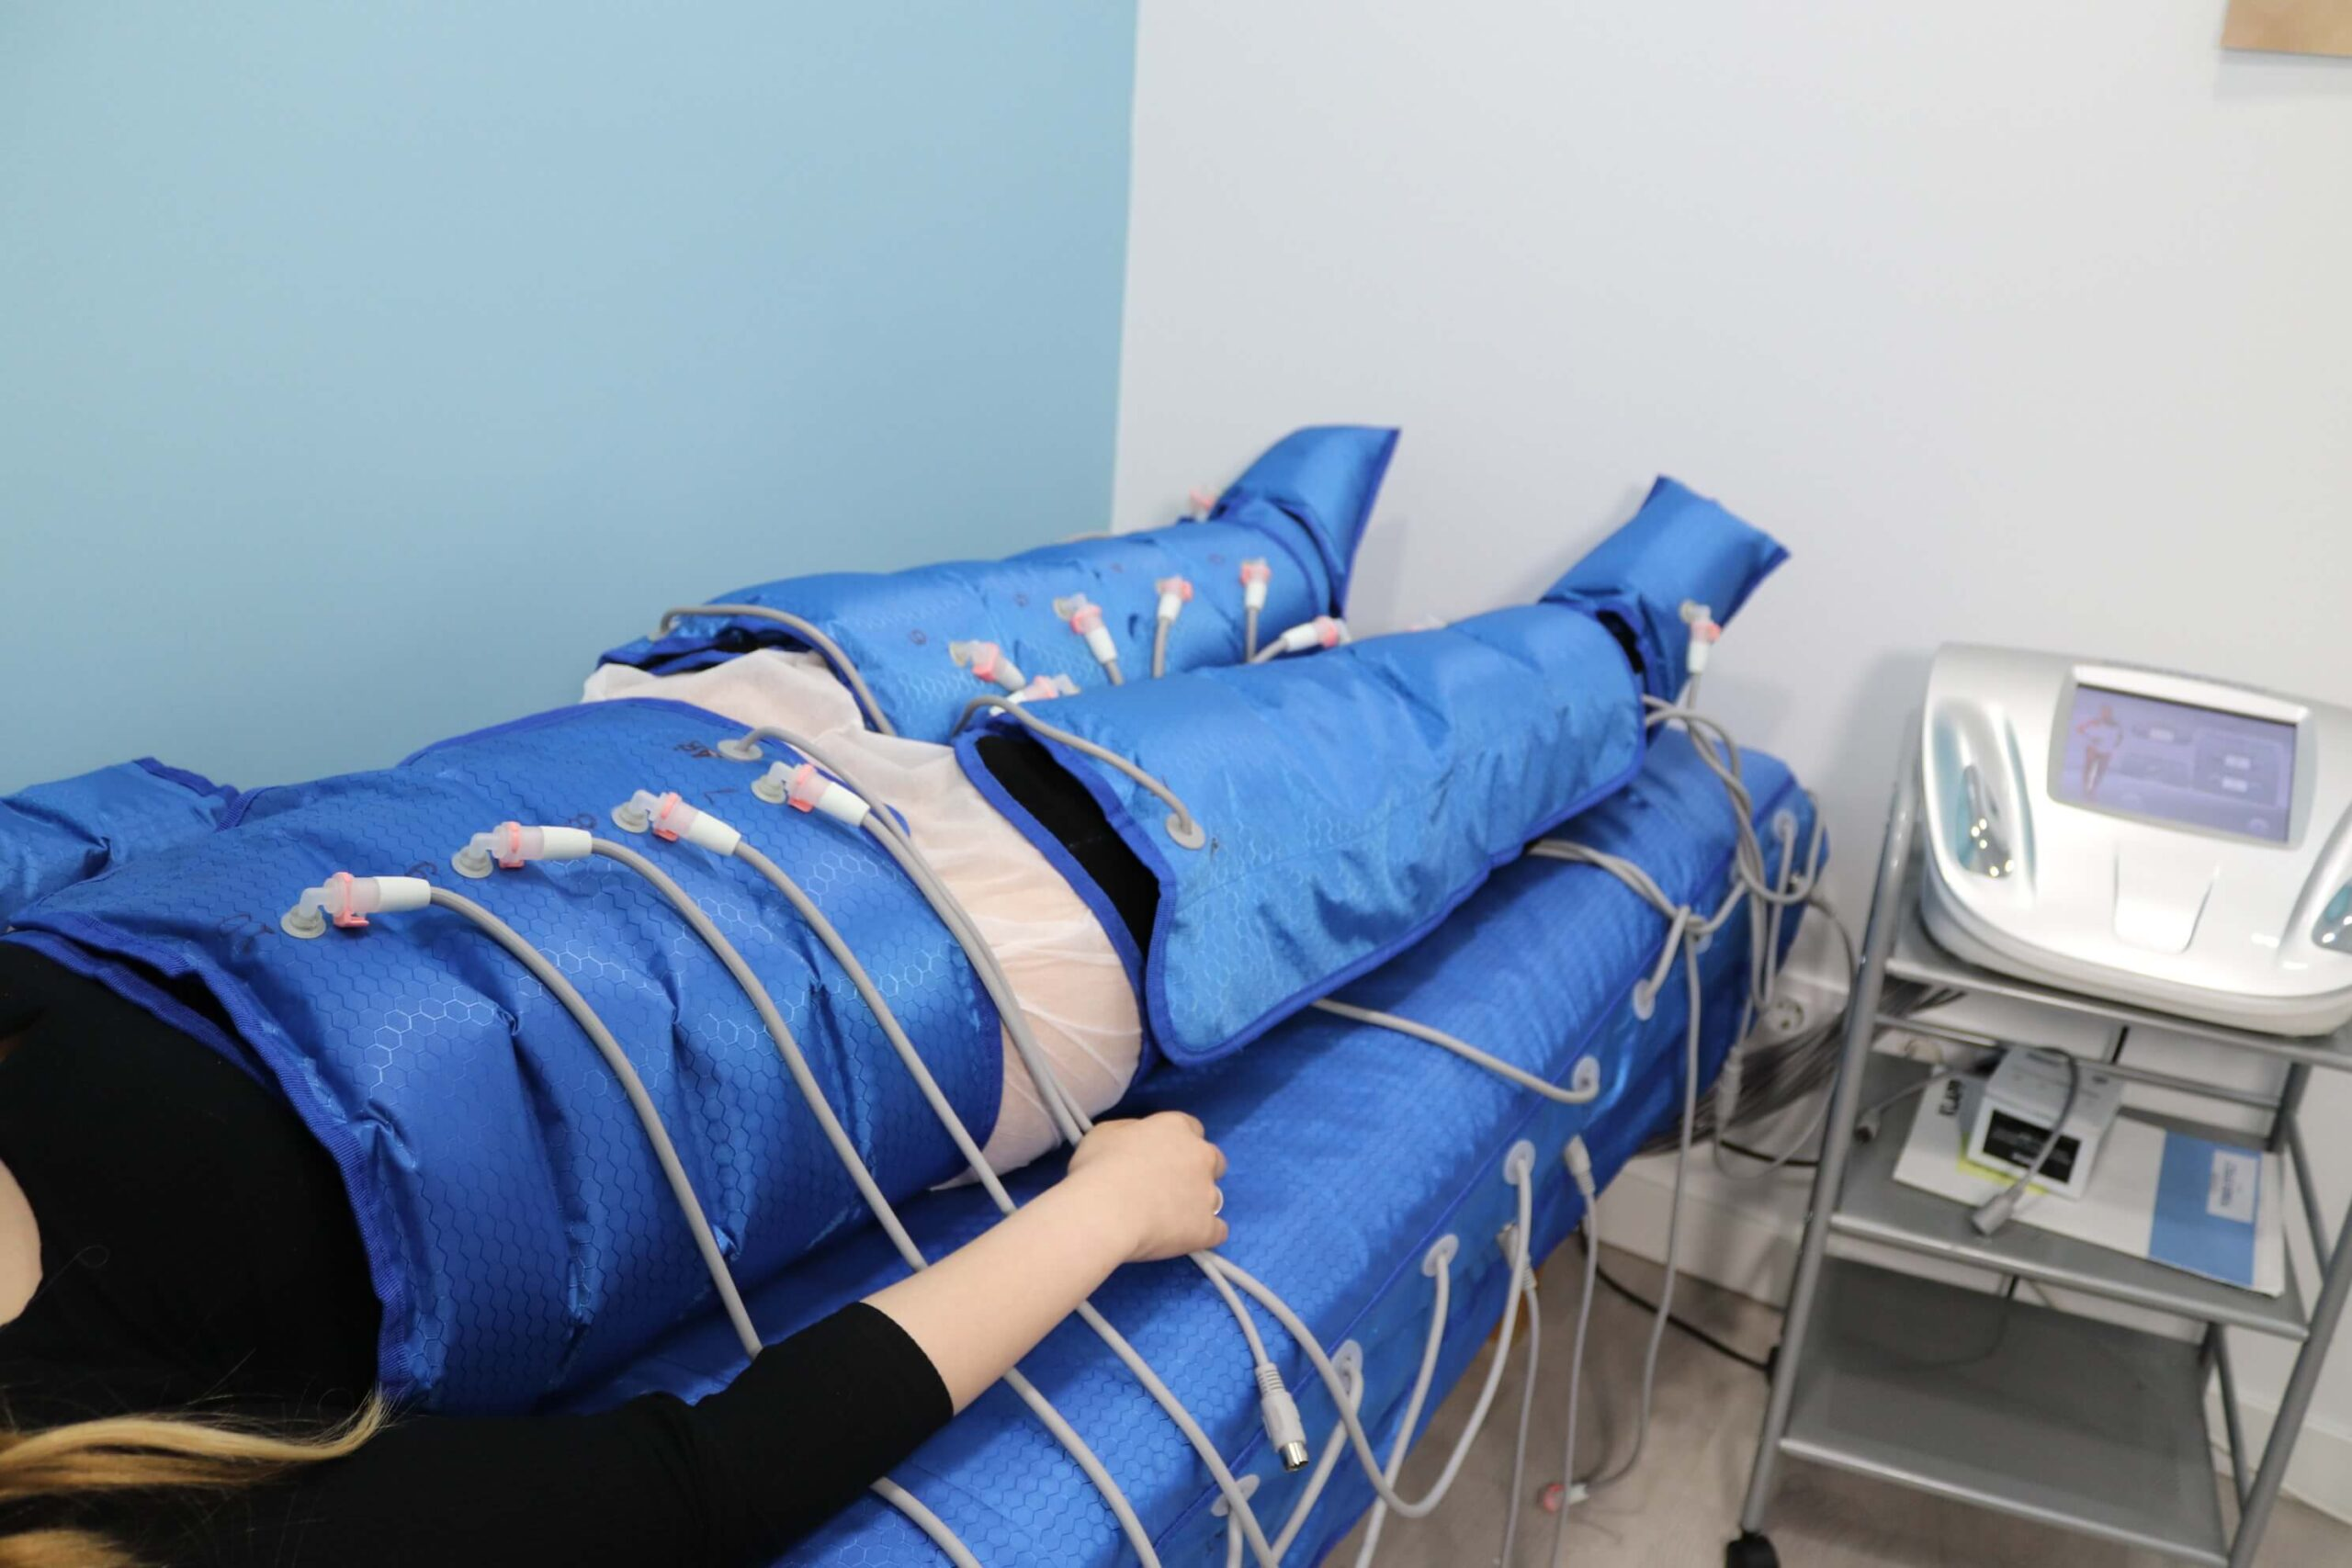 presoterapia foot and body